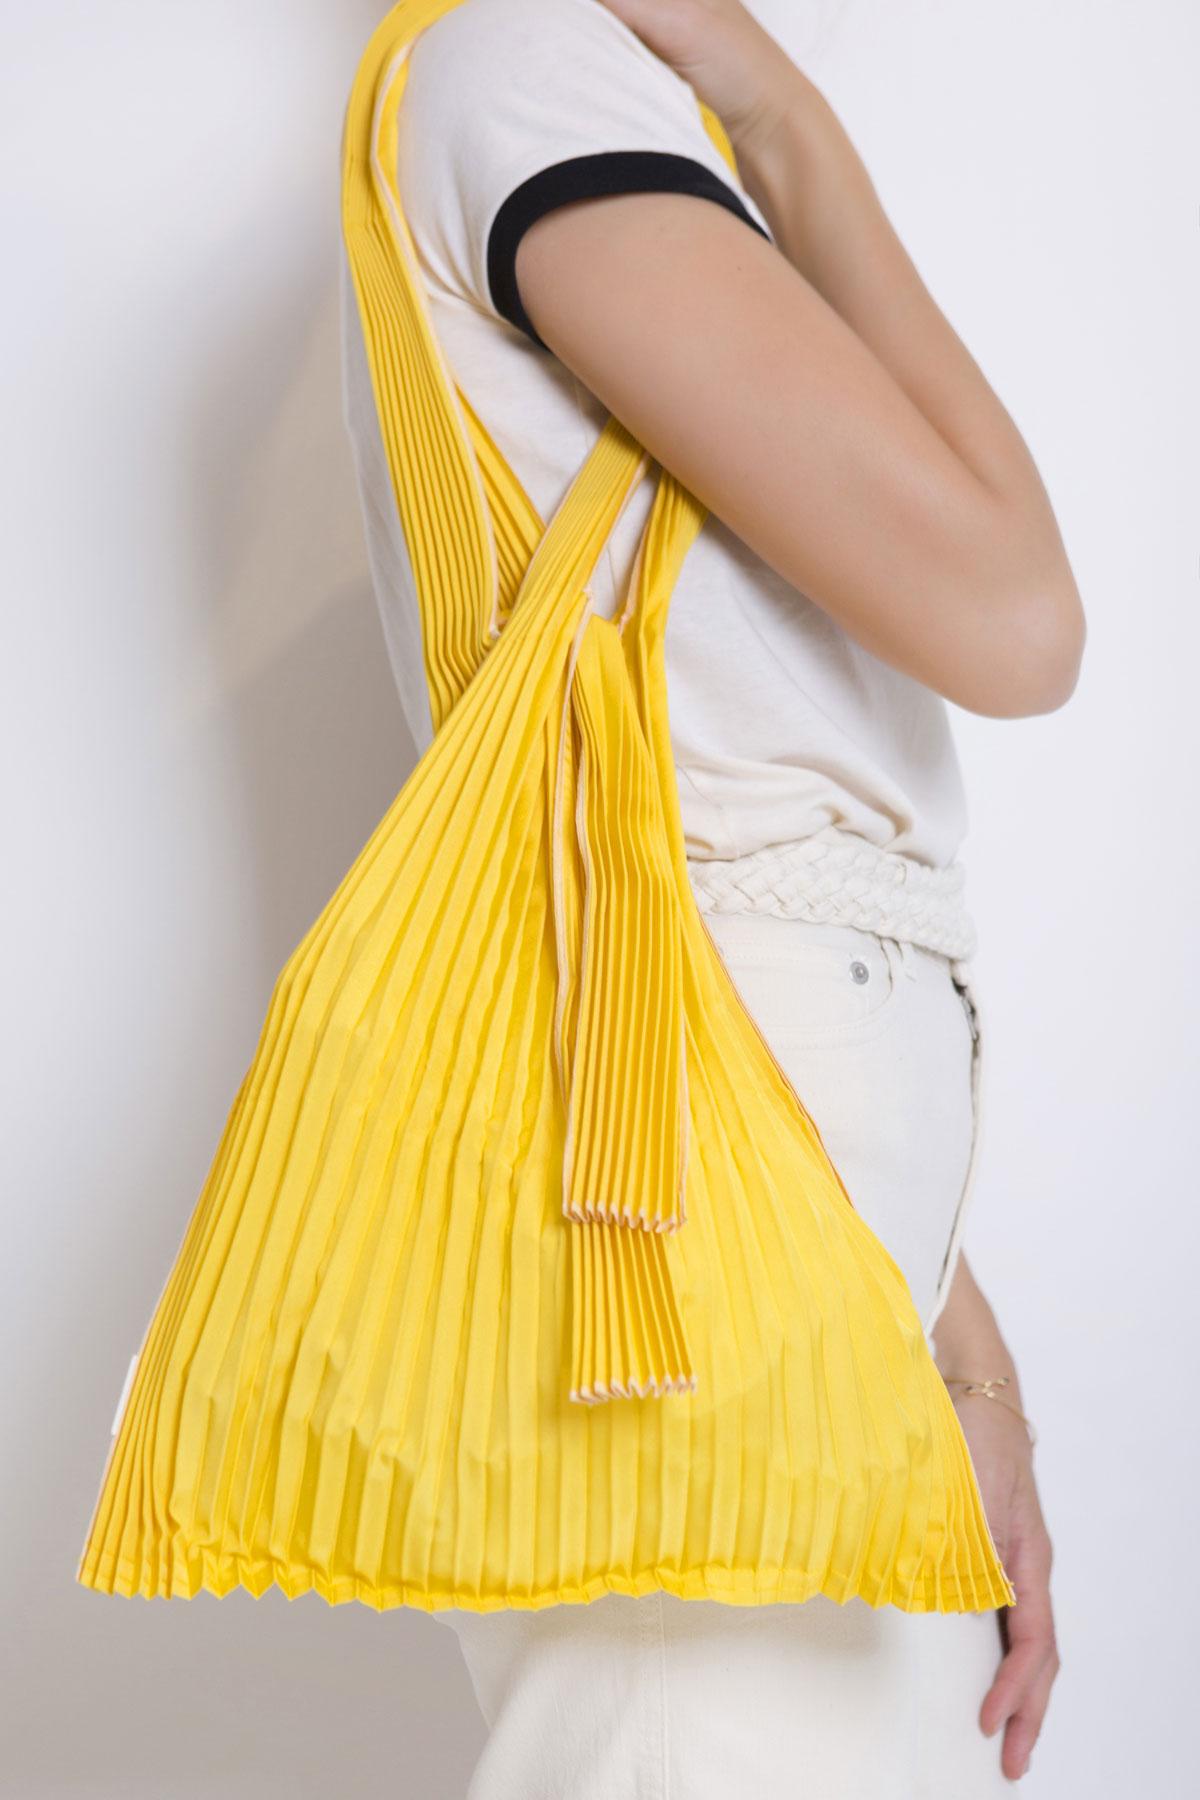 pleco-japan-pleated-bags-matchboxathens